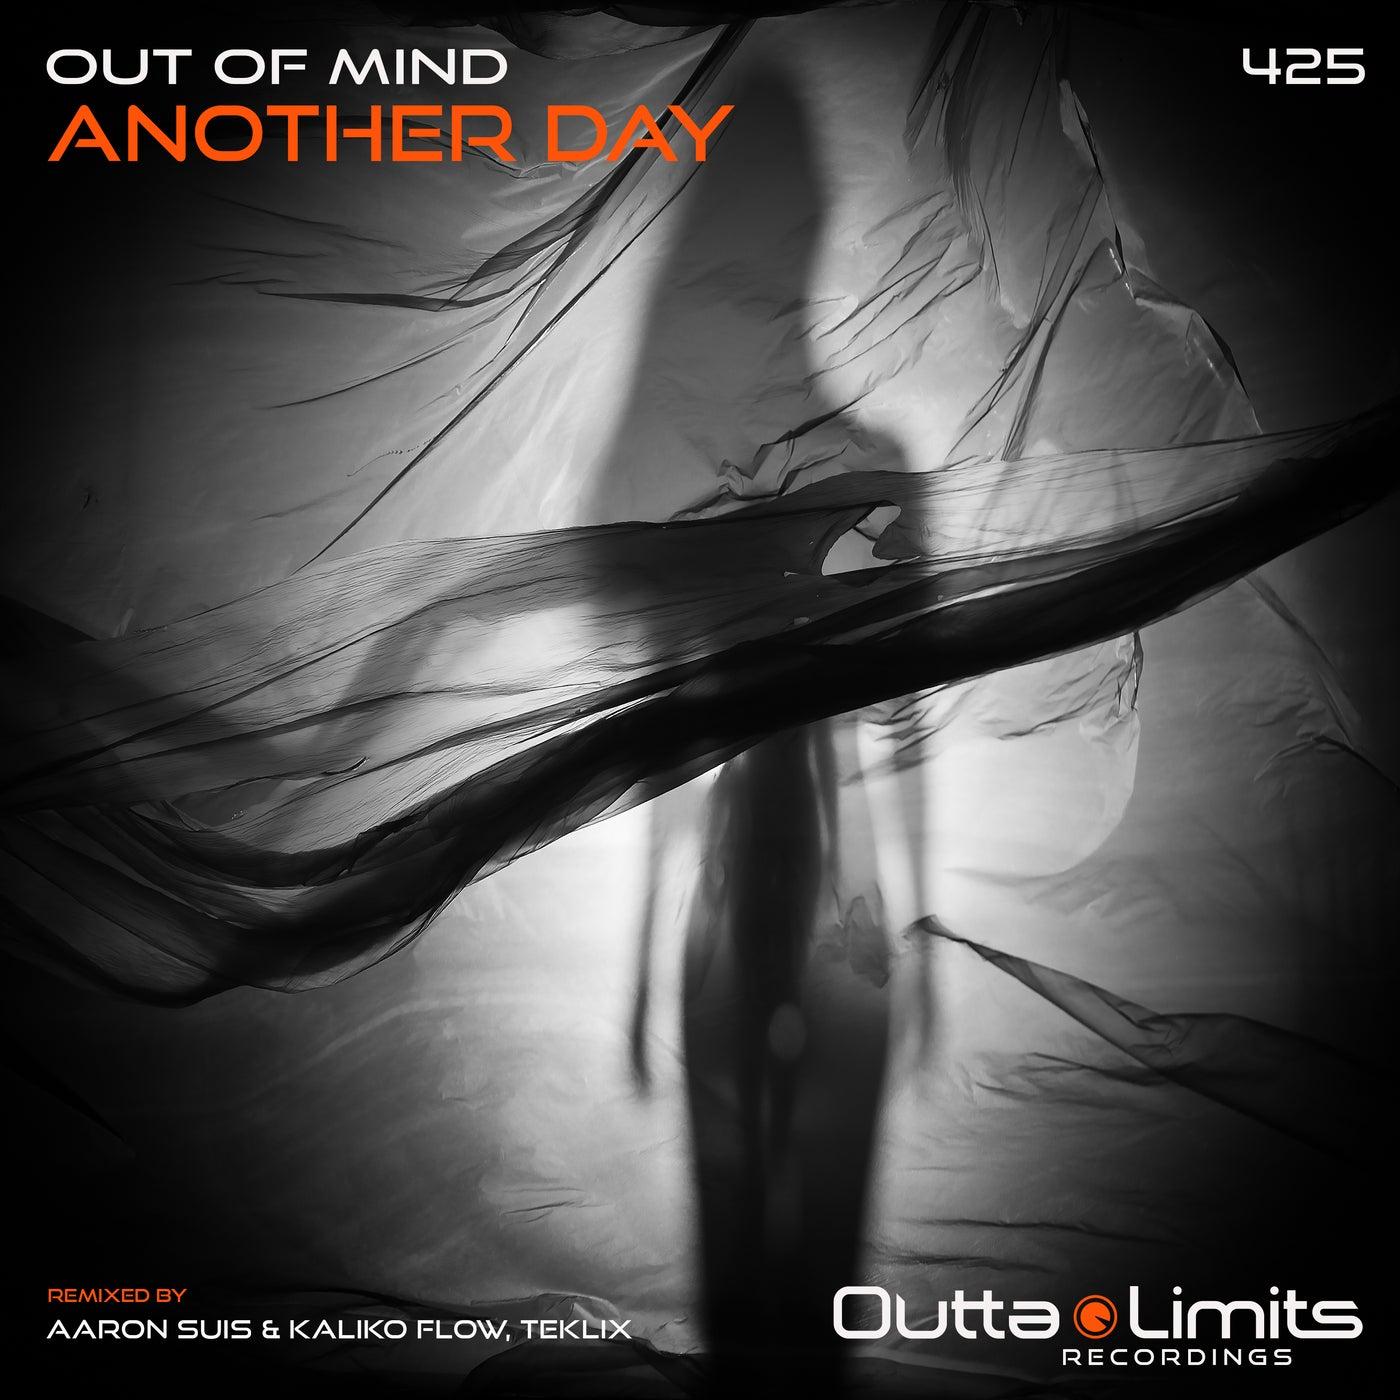 Another Day (Aaron Suiss & Kaliko Flow Remix)